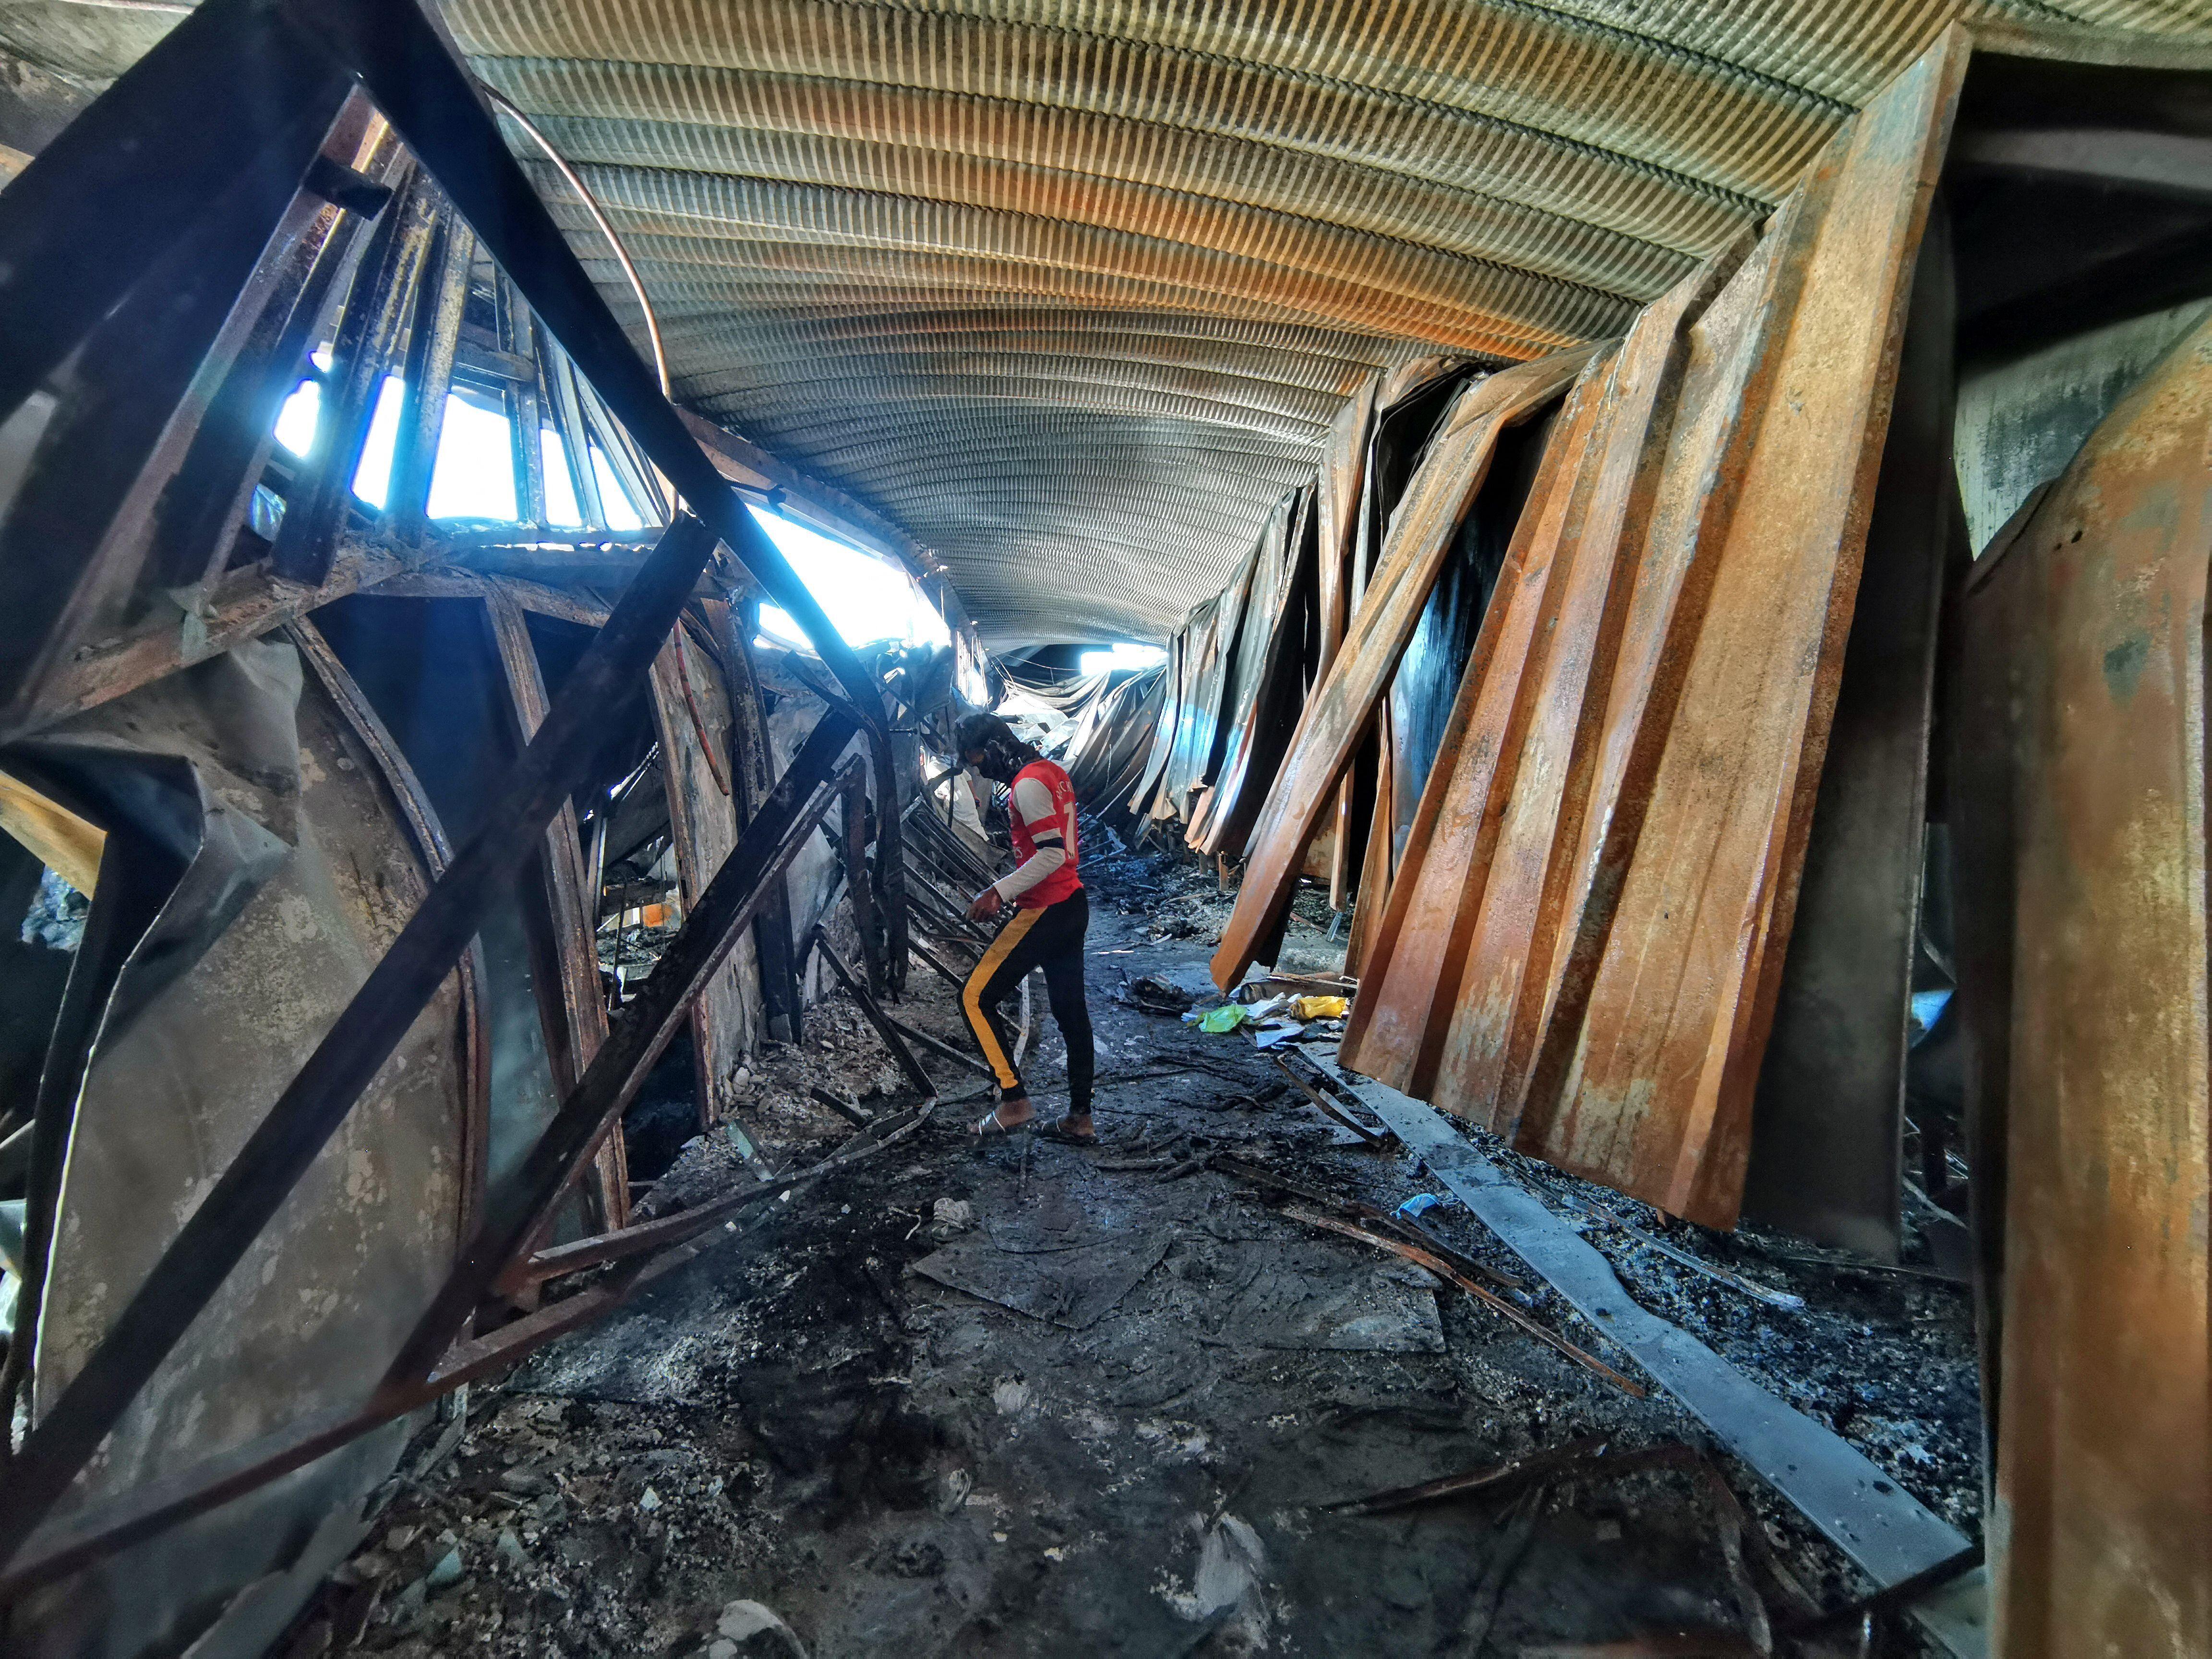 The coronavirus isolation ward of Al-Hussein hospital was ravaged in the blaze.